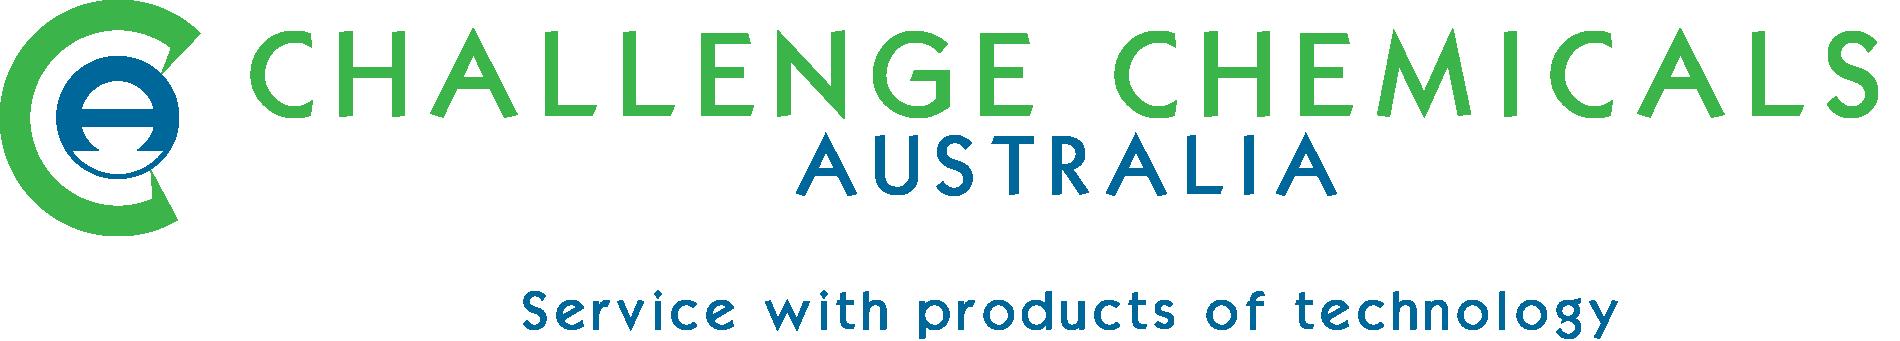 Challenge Chemicals